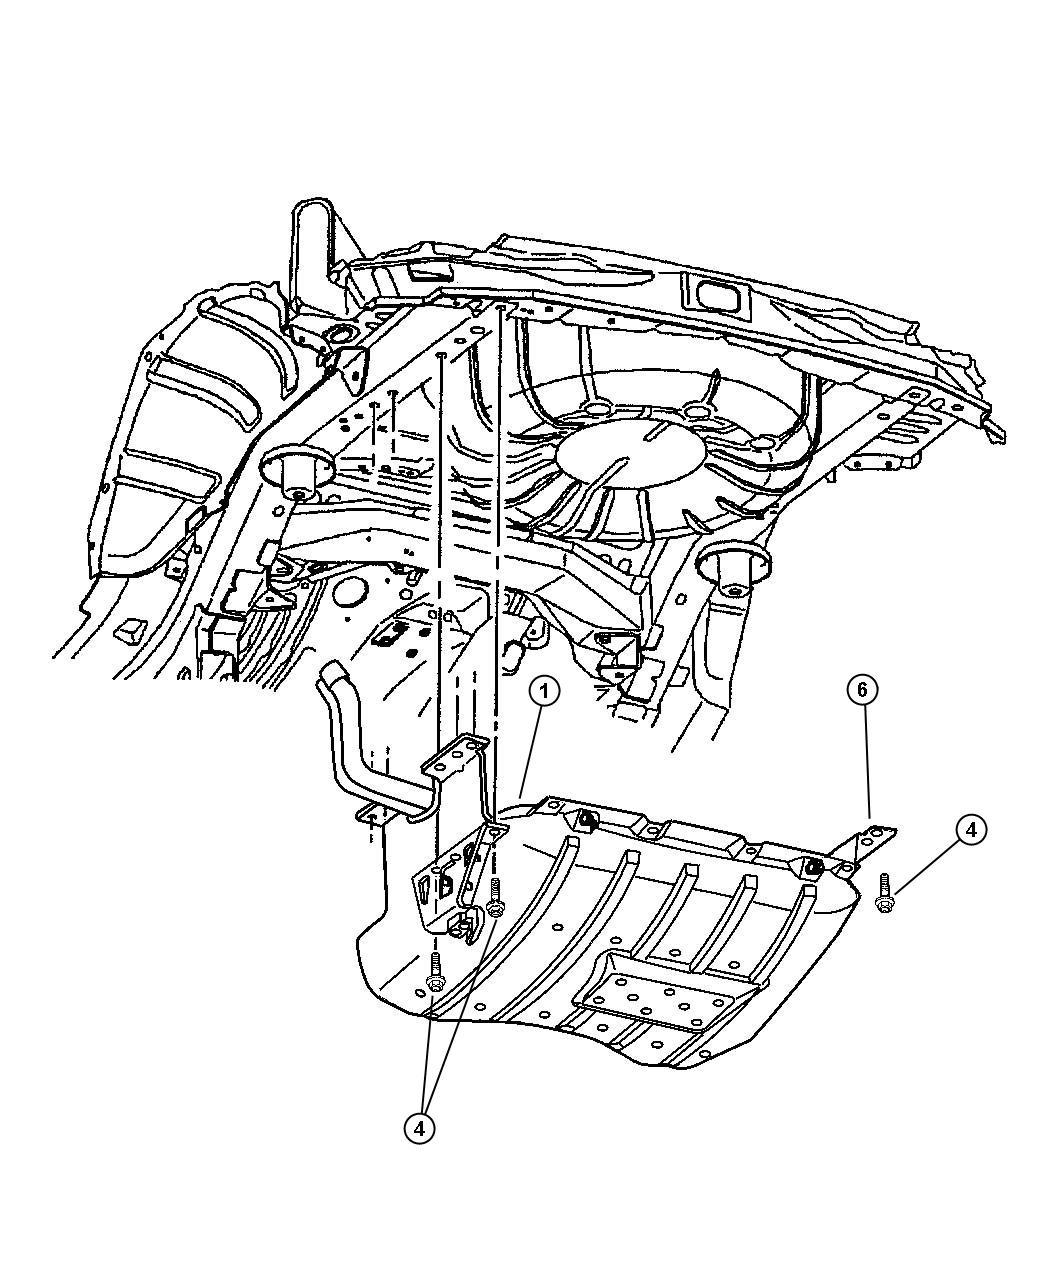 oem jeep grand cherokee parts online factory chrysler